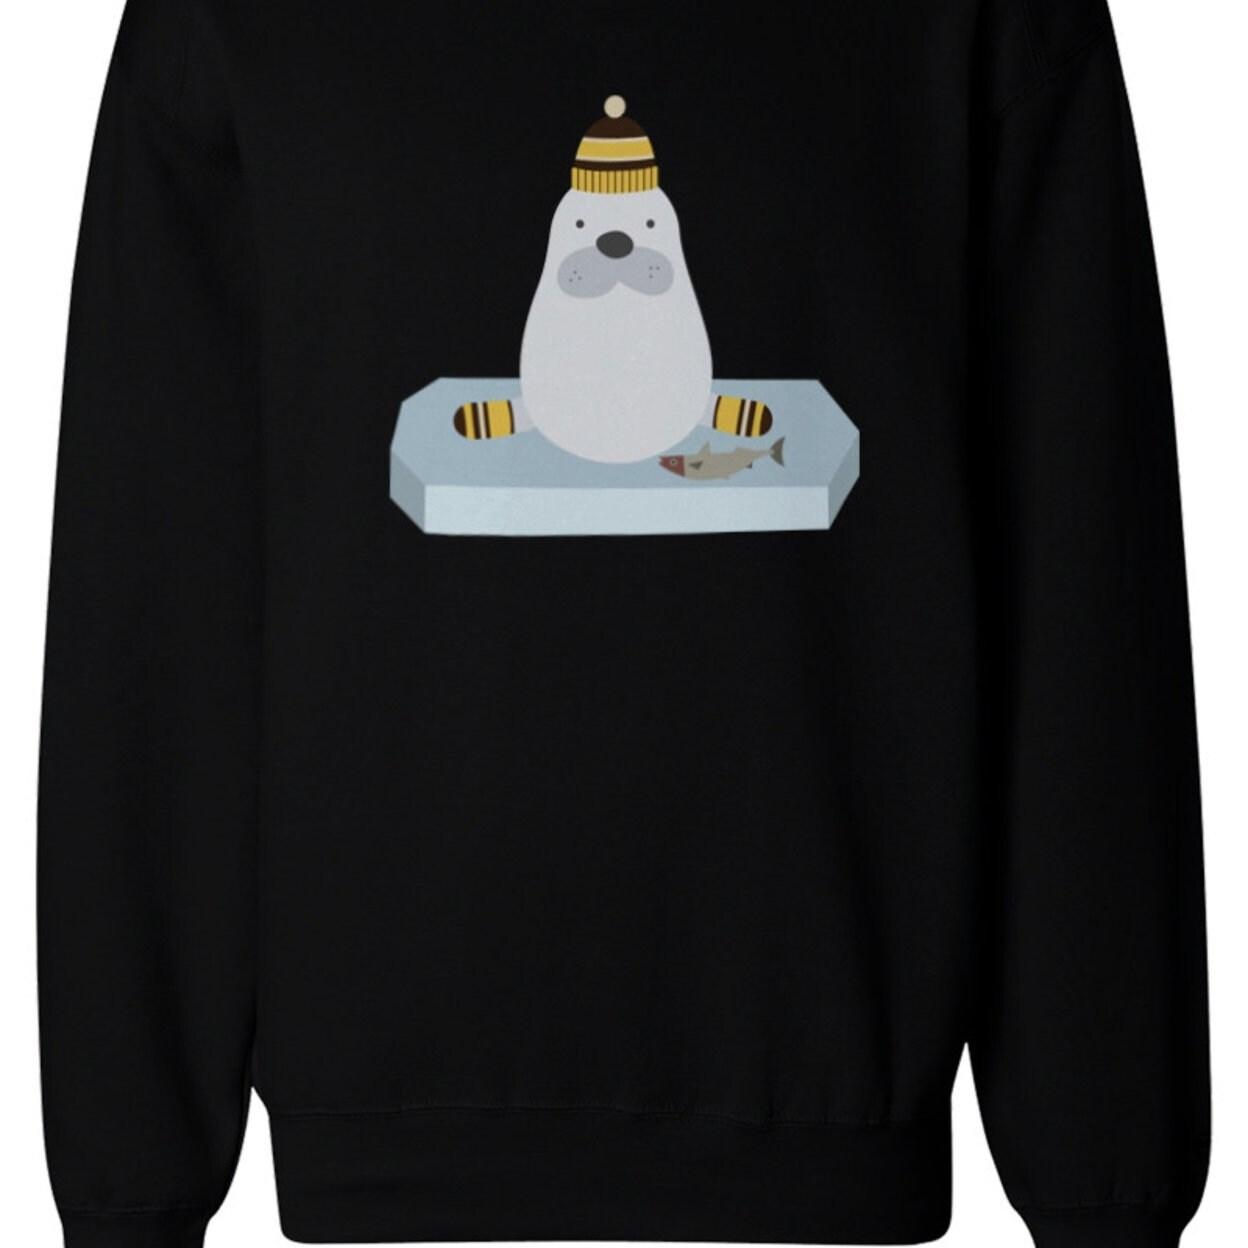 Cute Penguin is Ice Fishing Christmas Sweatshirt Winter Unisex Pullover Fleece